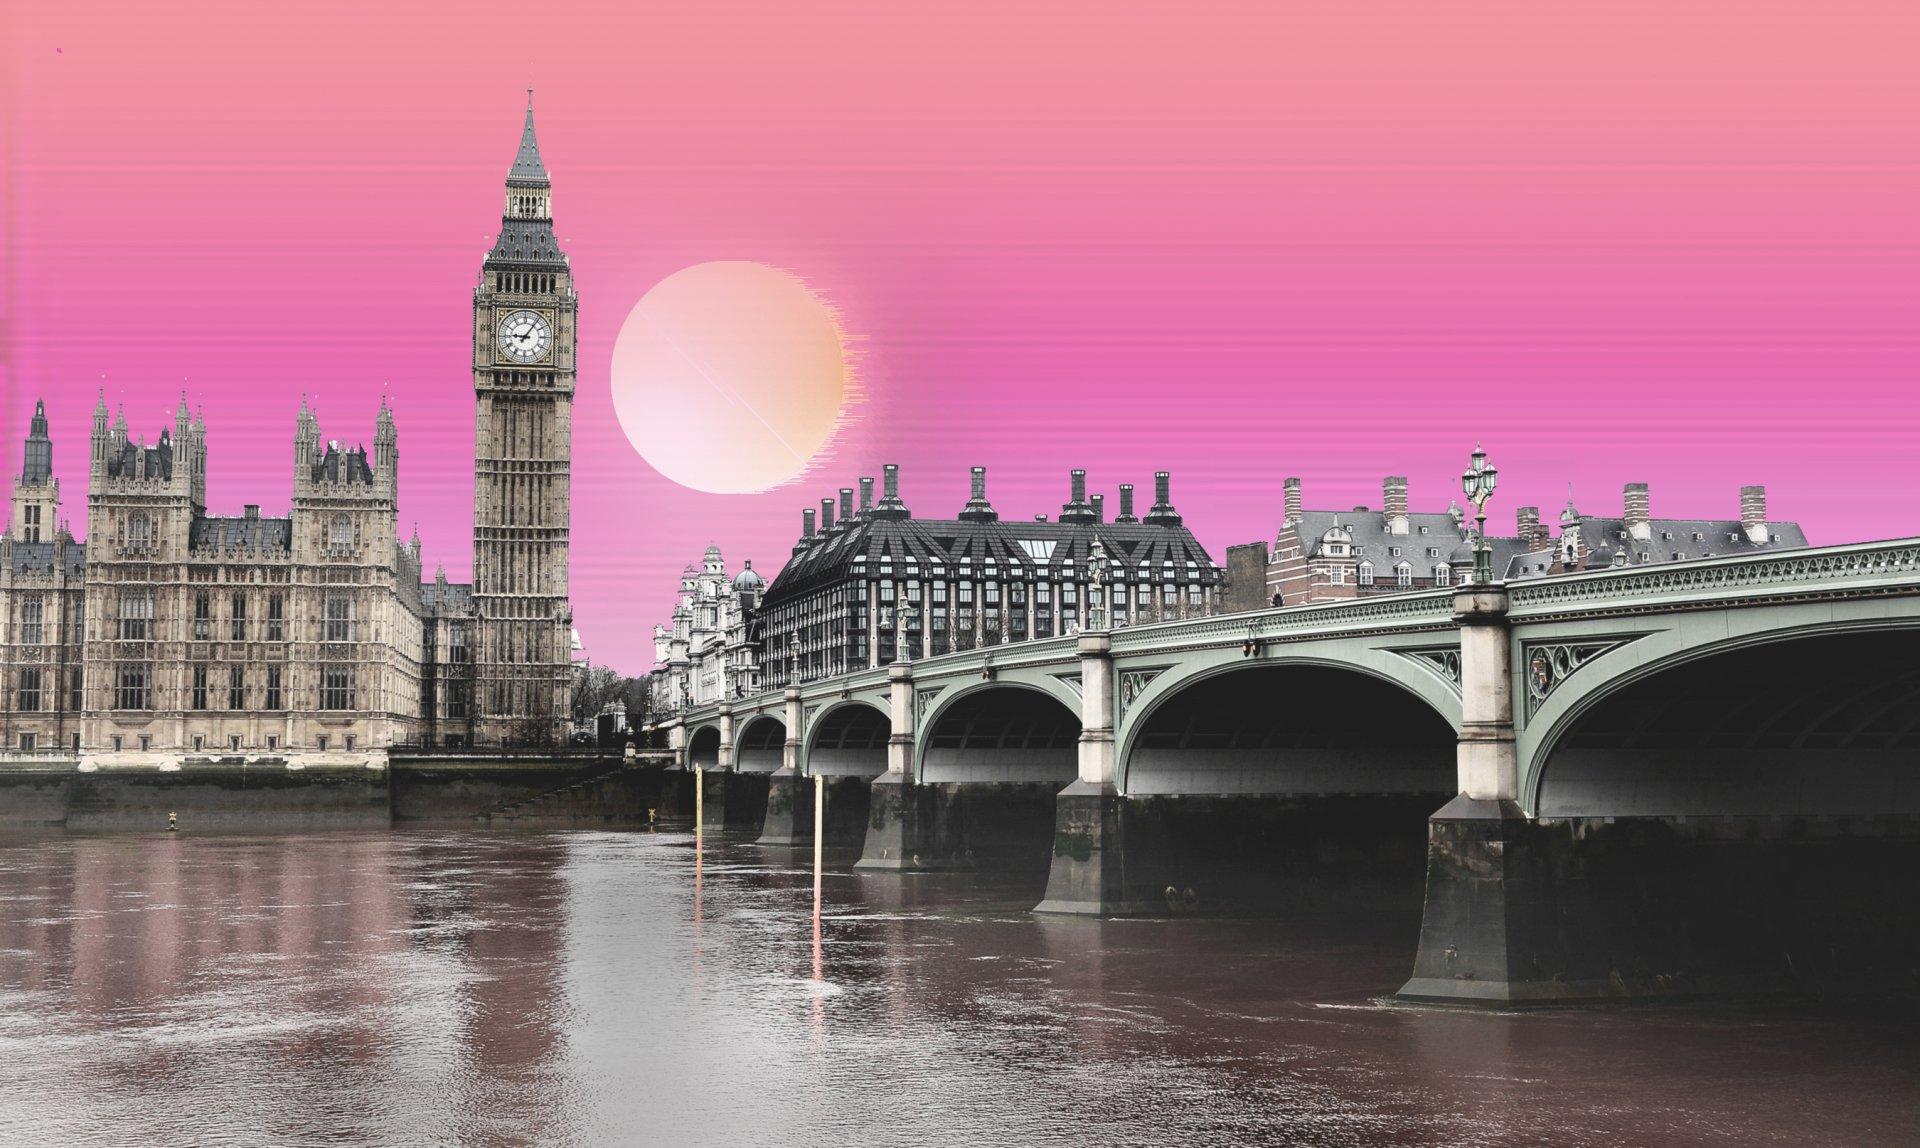 London Wallpaper Hd 1920x1080 Vaporwave The Big Ben Hd Wallpaper Background Image